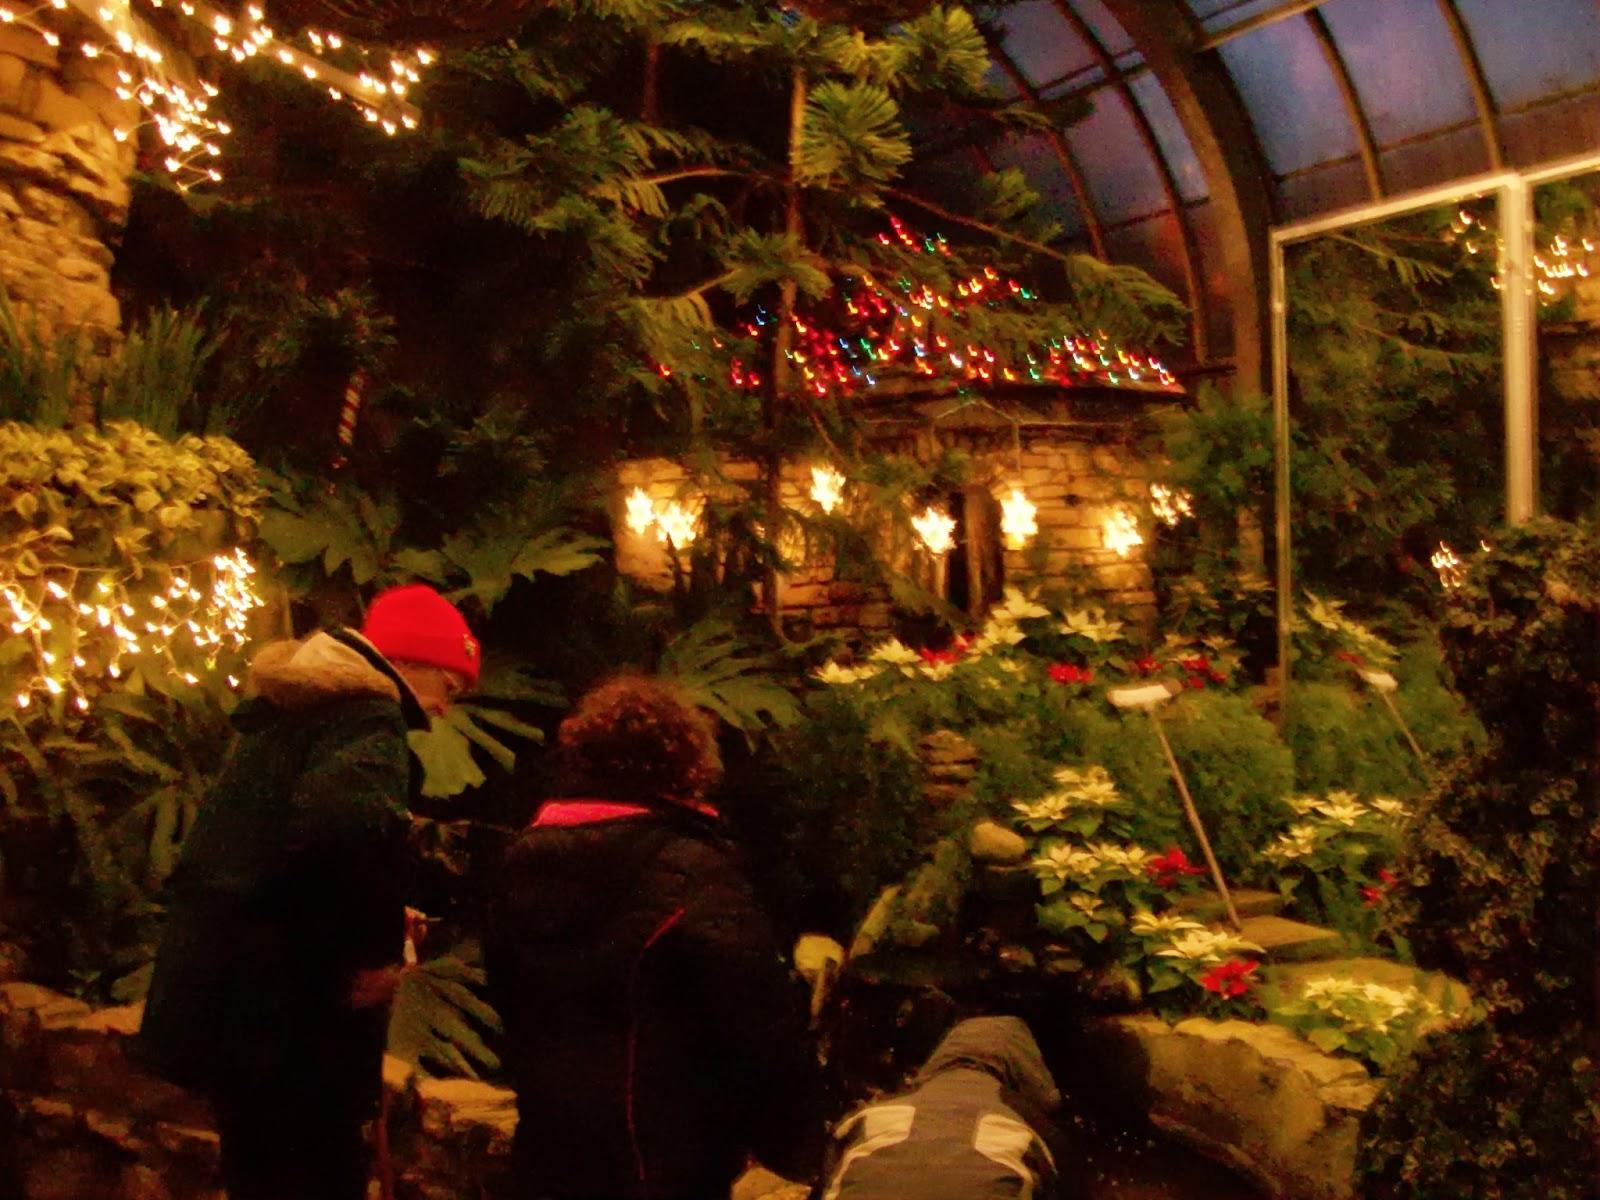 Agastache in the Garden: Vander Veer Conservatory Christmastime